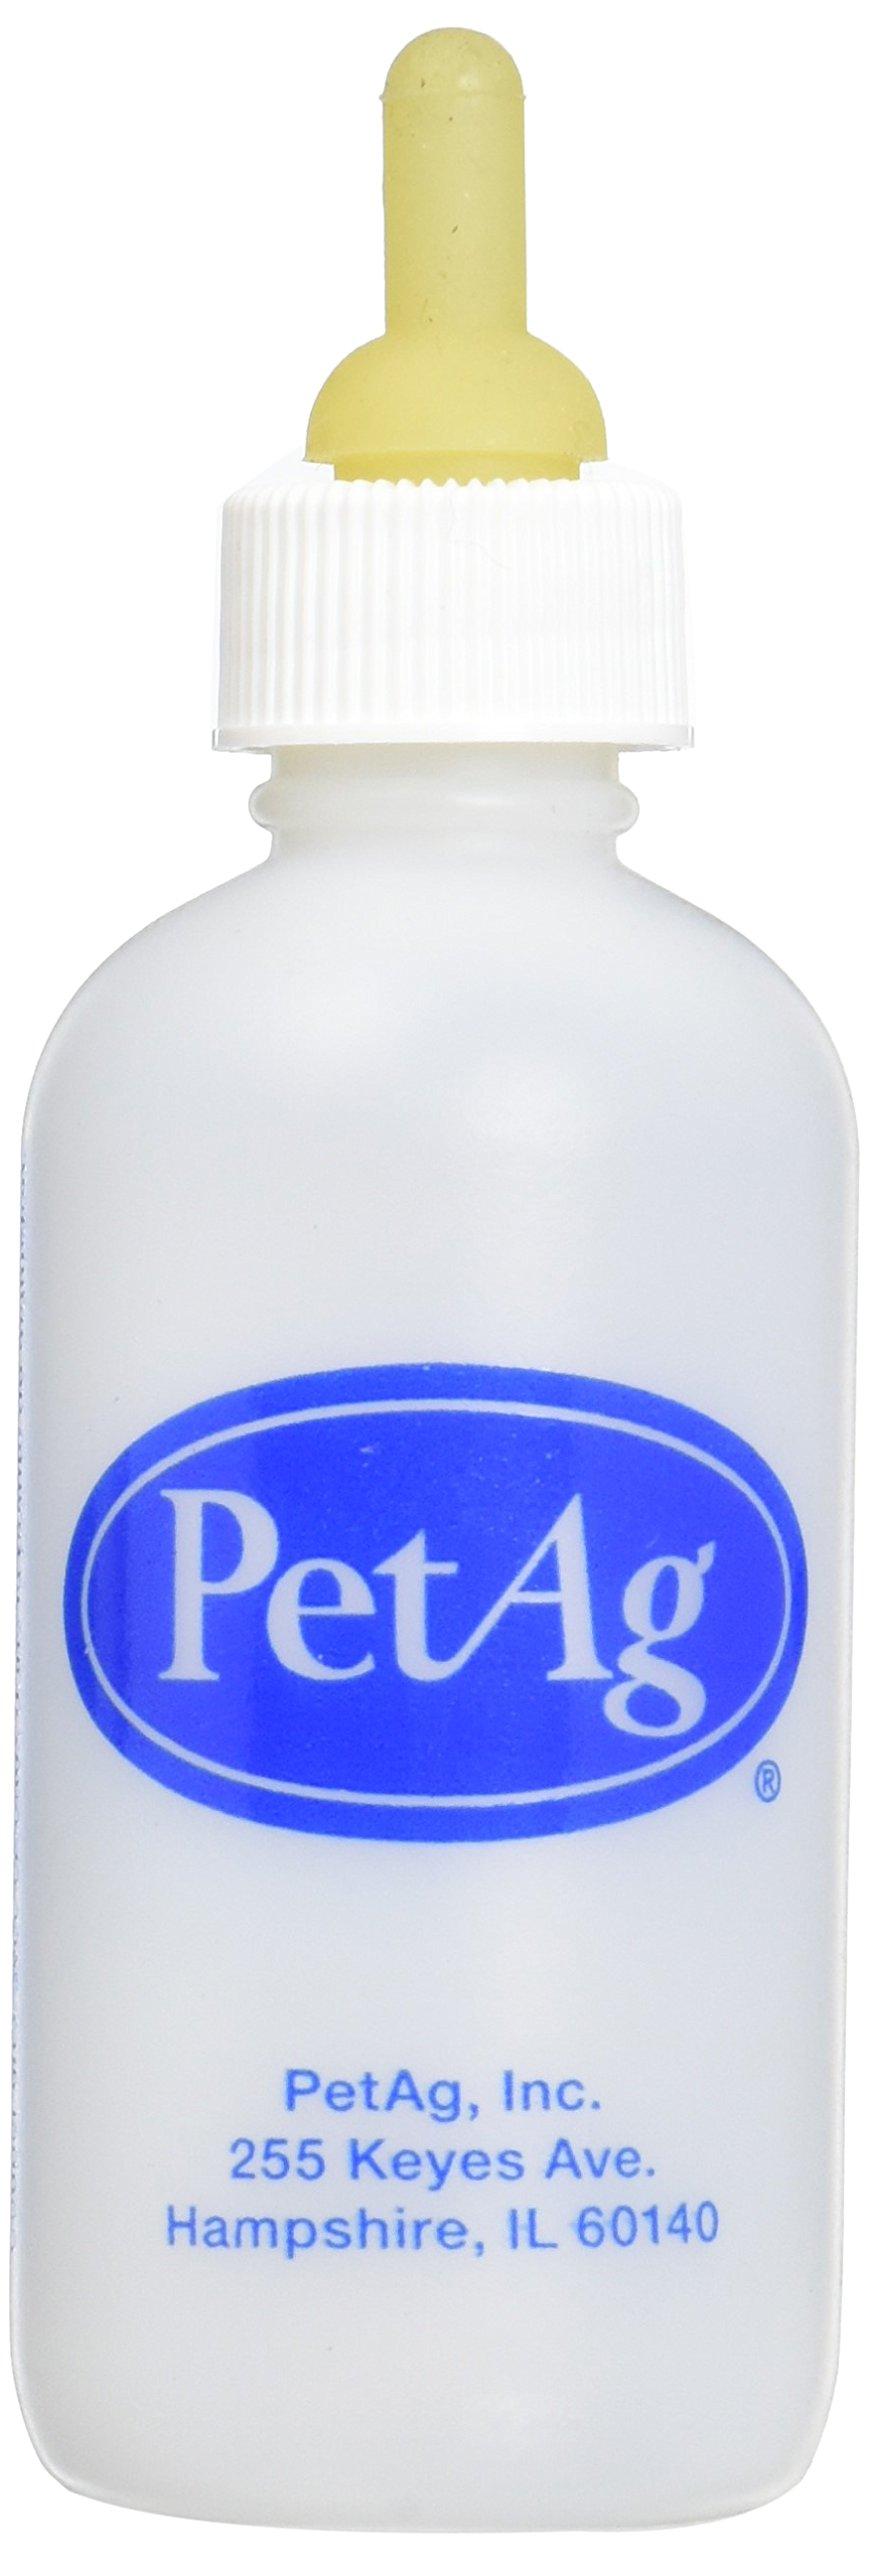 PetAg Nurser Bottle for Smaller Baby Animals - 2 oz. 2 oz.